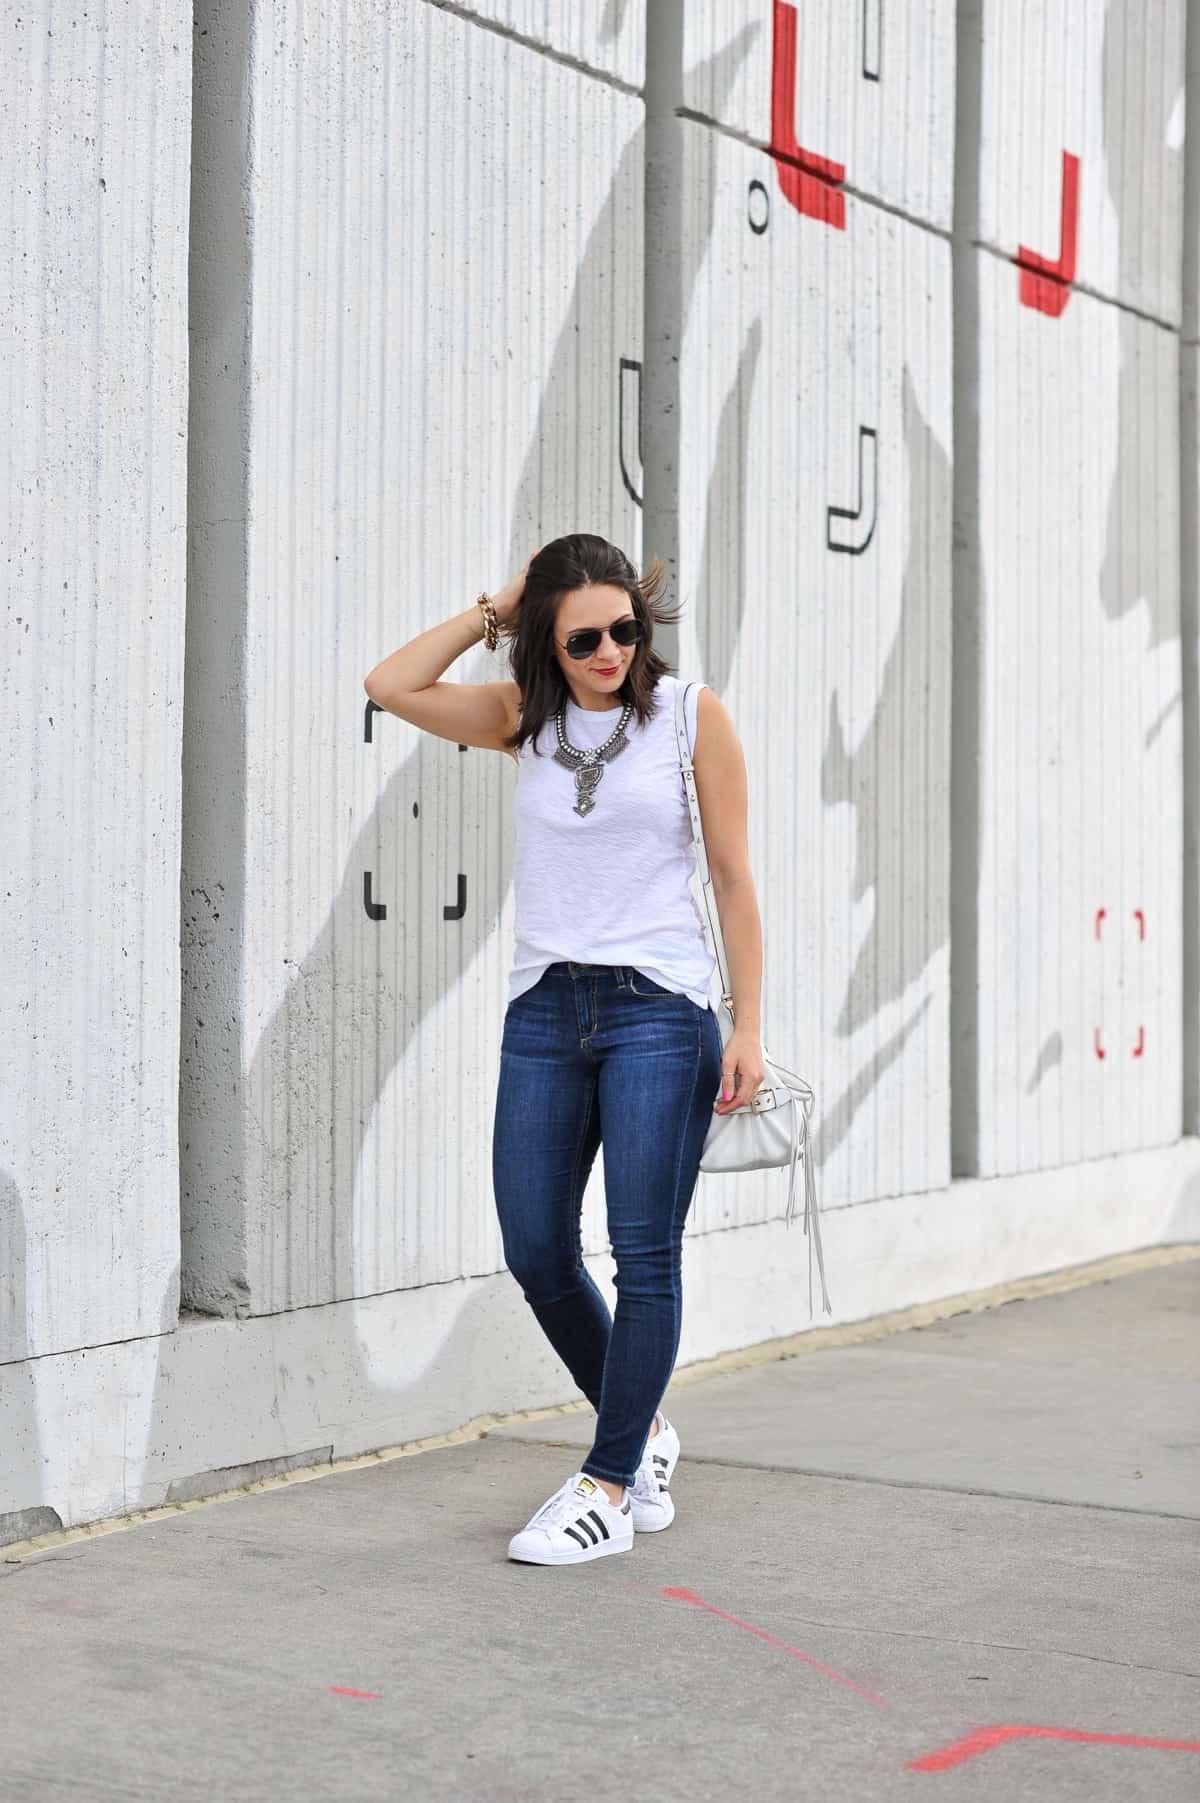 adidas originals, street style, My Style Vita - @mystylevita - 5